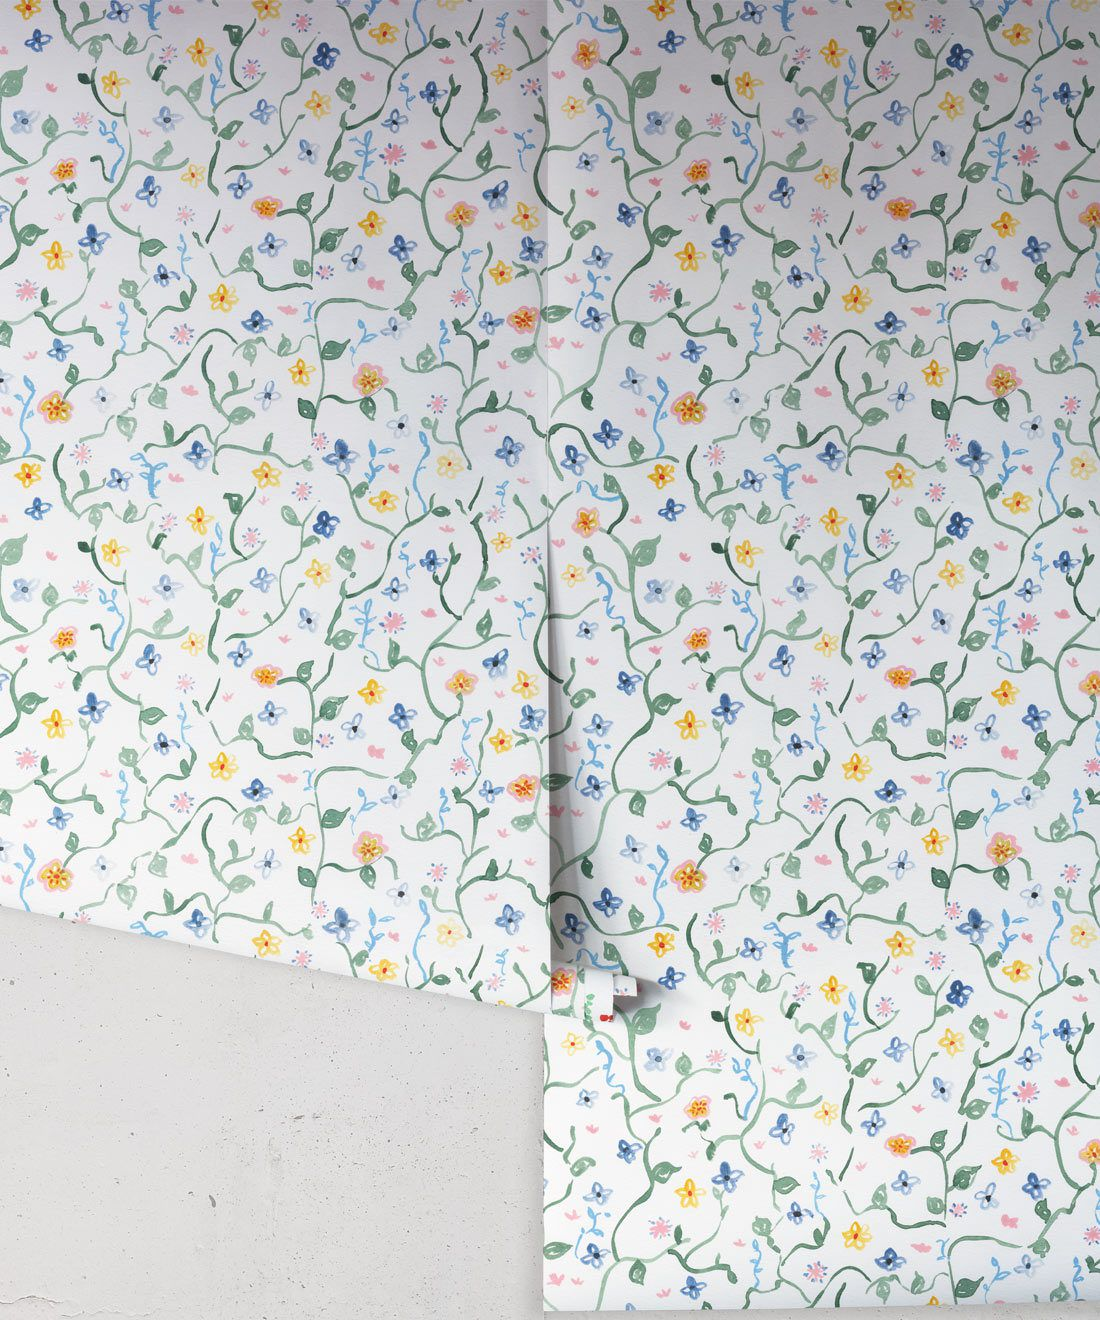 Wild Garden • Dainty Floral Wallpaper • Milton & King Australia •Georgia MacMillan • Childrens Wallpaper • Nursery Wallpaper